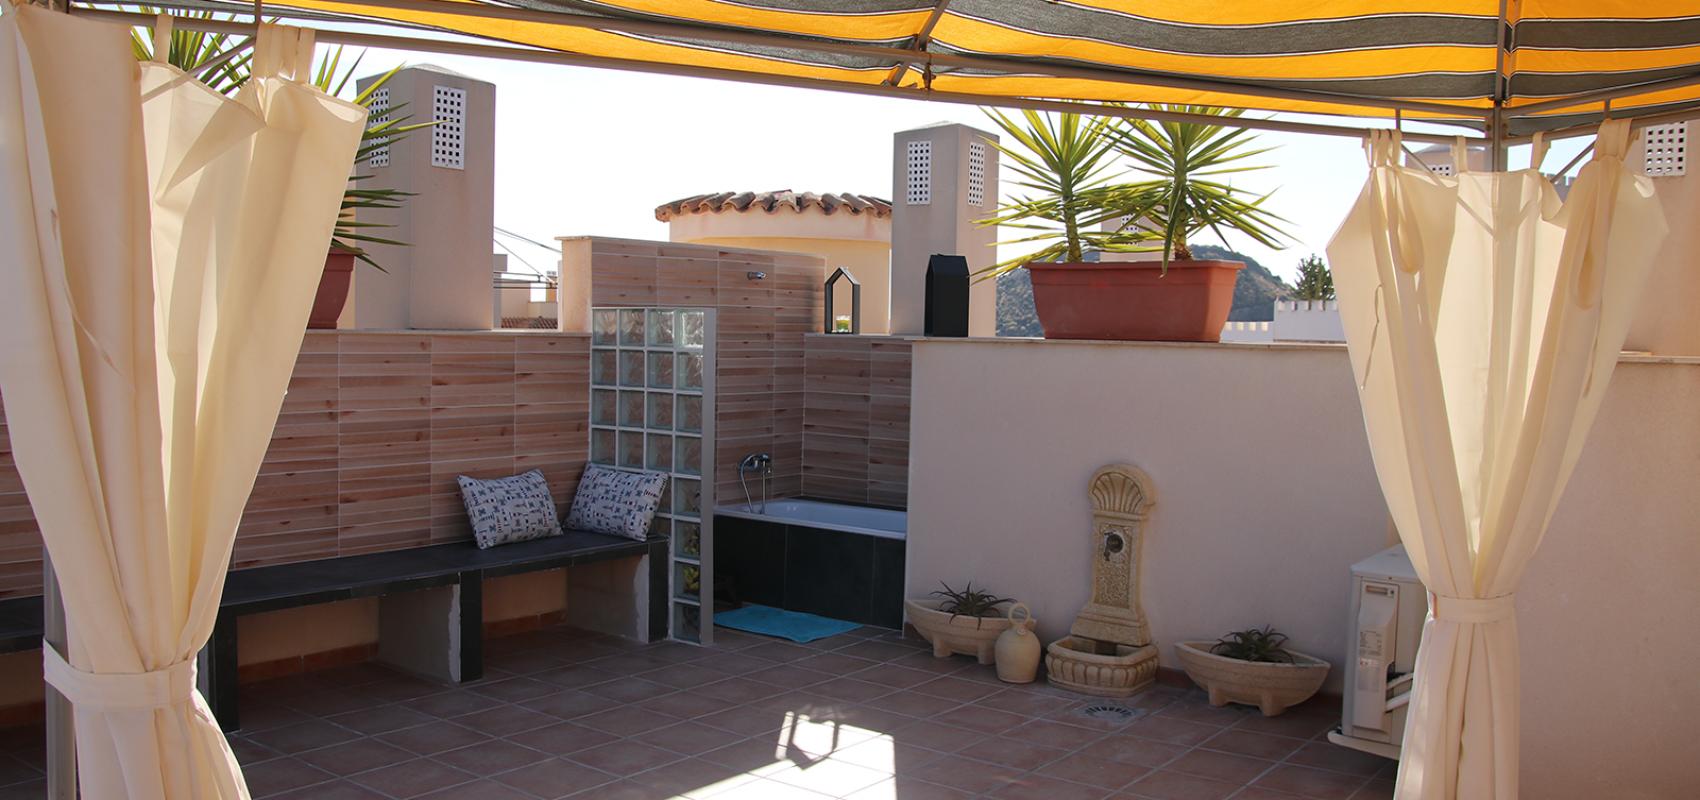 Alma Terrace 2 new